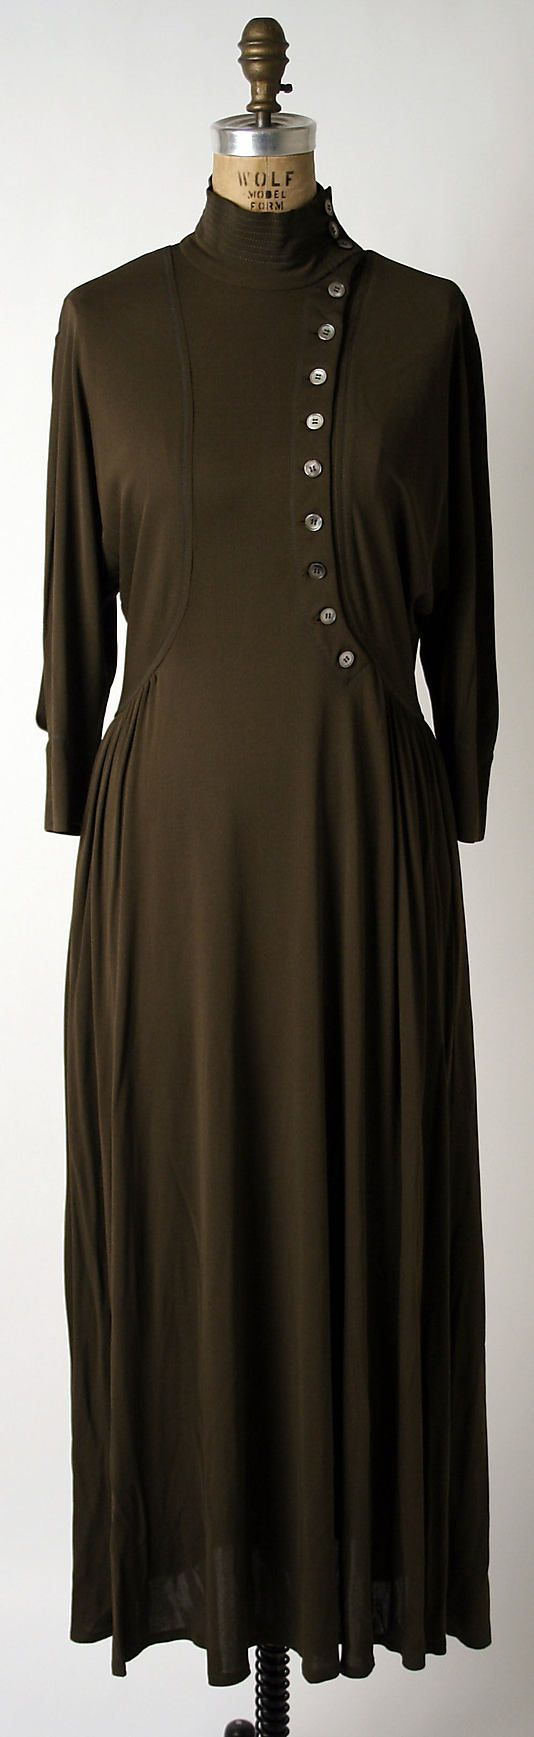 Dress, Dinner  Jean Muir  (British, 1928–1995), Date: 1973–75